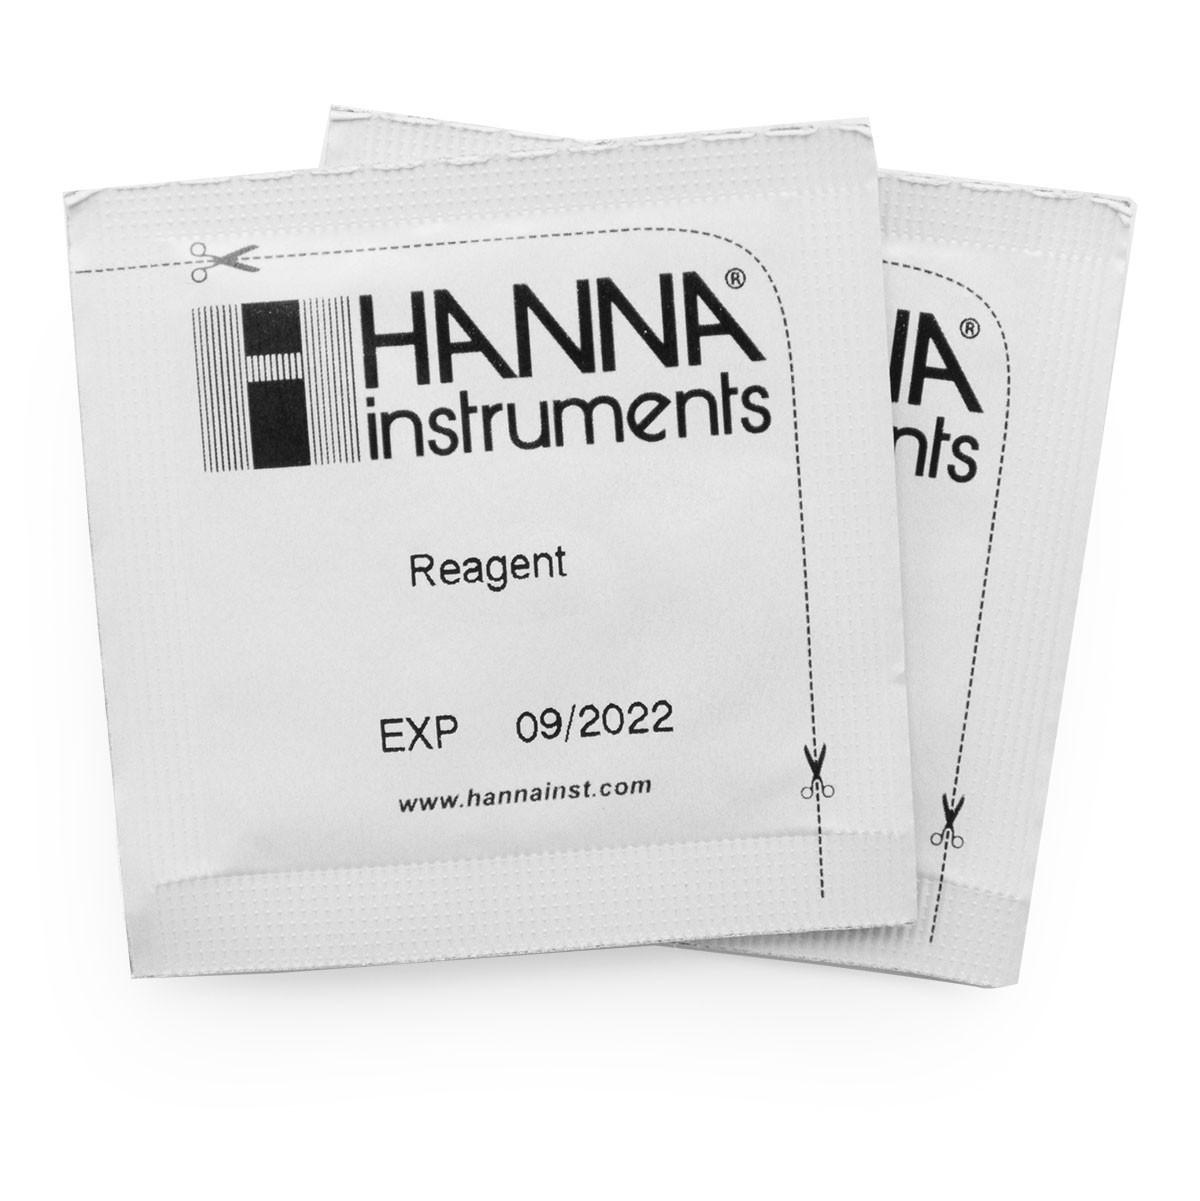 Iron Low Range Reagents (100 tests)